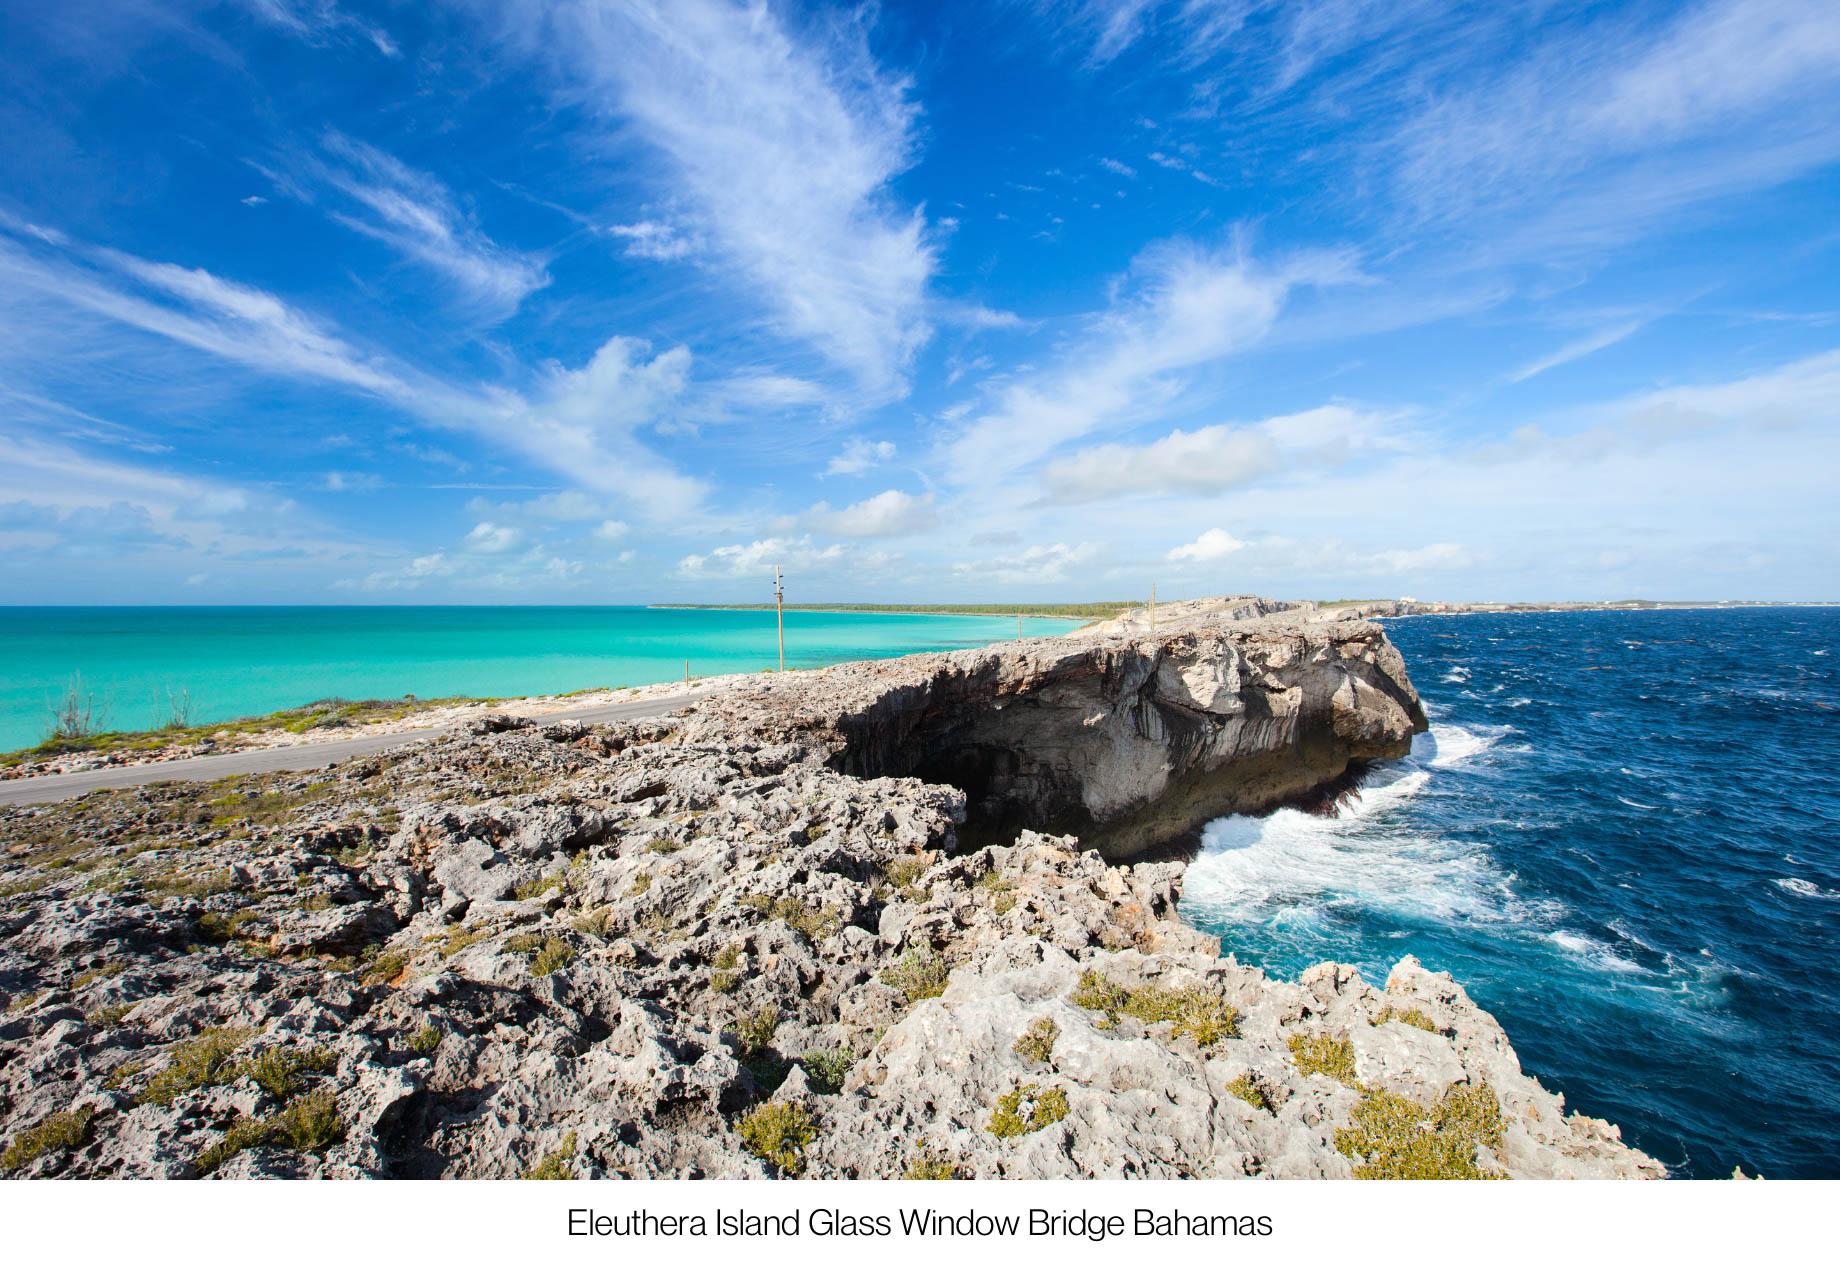 Discover The Hidden Island Gems of The Bahamas - Eleuthera Island Glass Window Bridge Bahamas